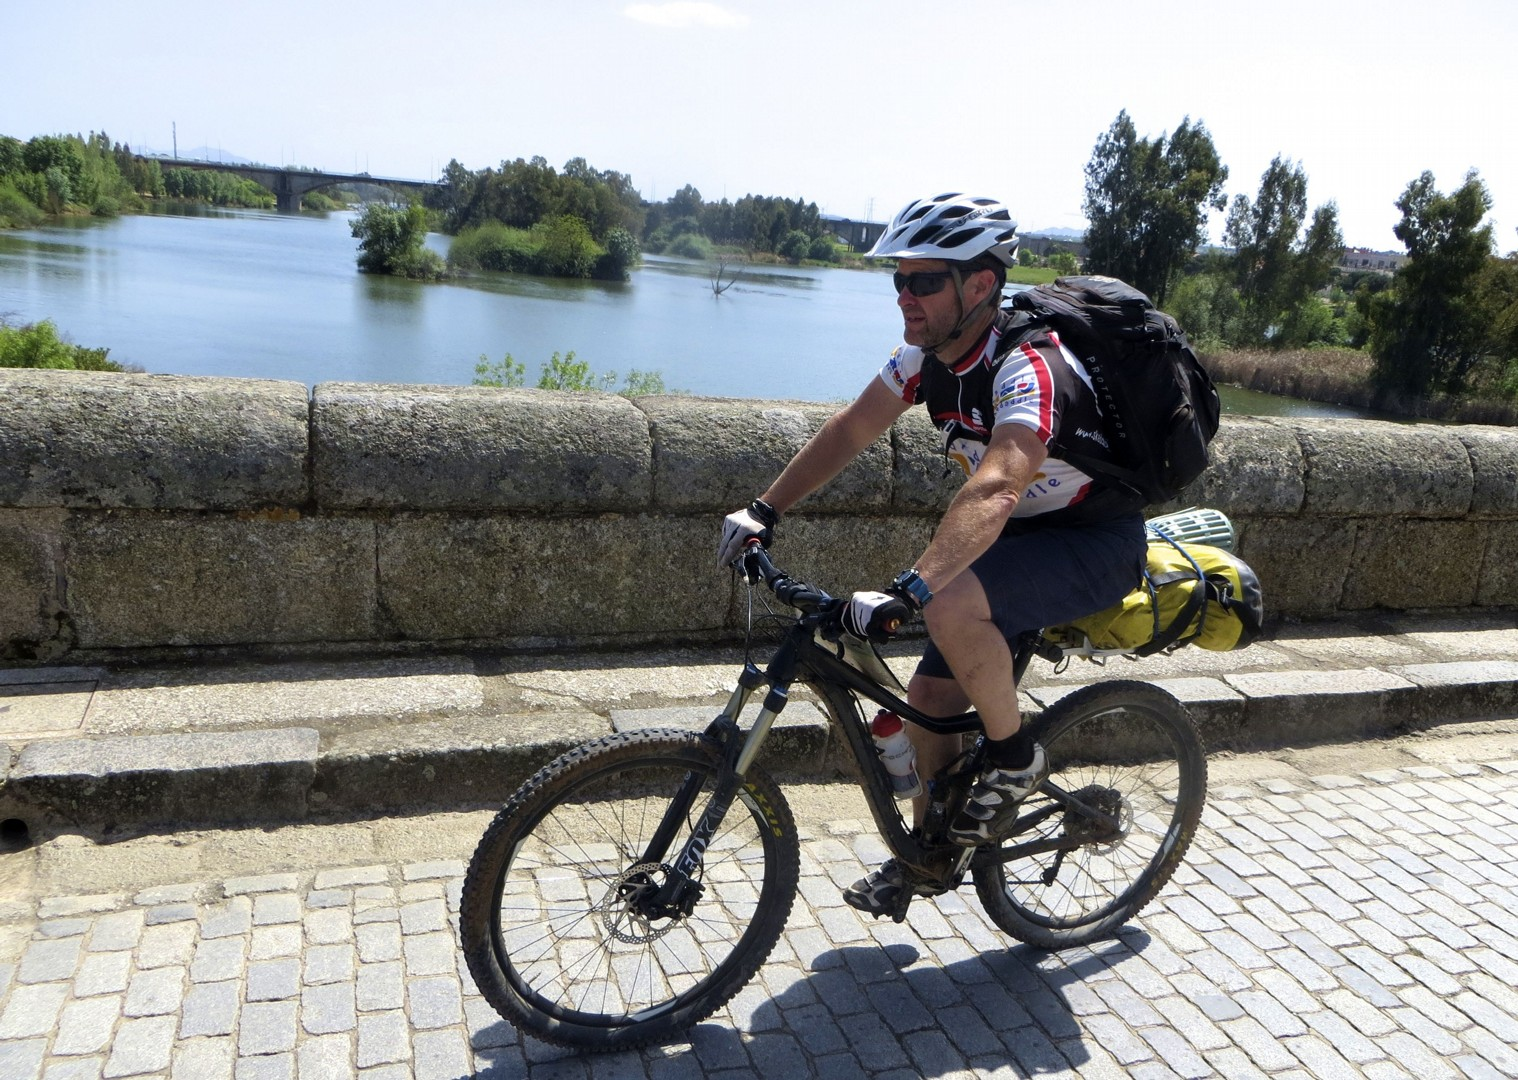 rutaplata2.jpg - Spain - Ruta de la Plata - Guided Mountain Bike Holiday - Mountain Biking